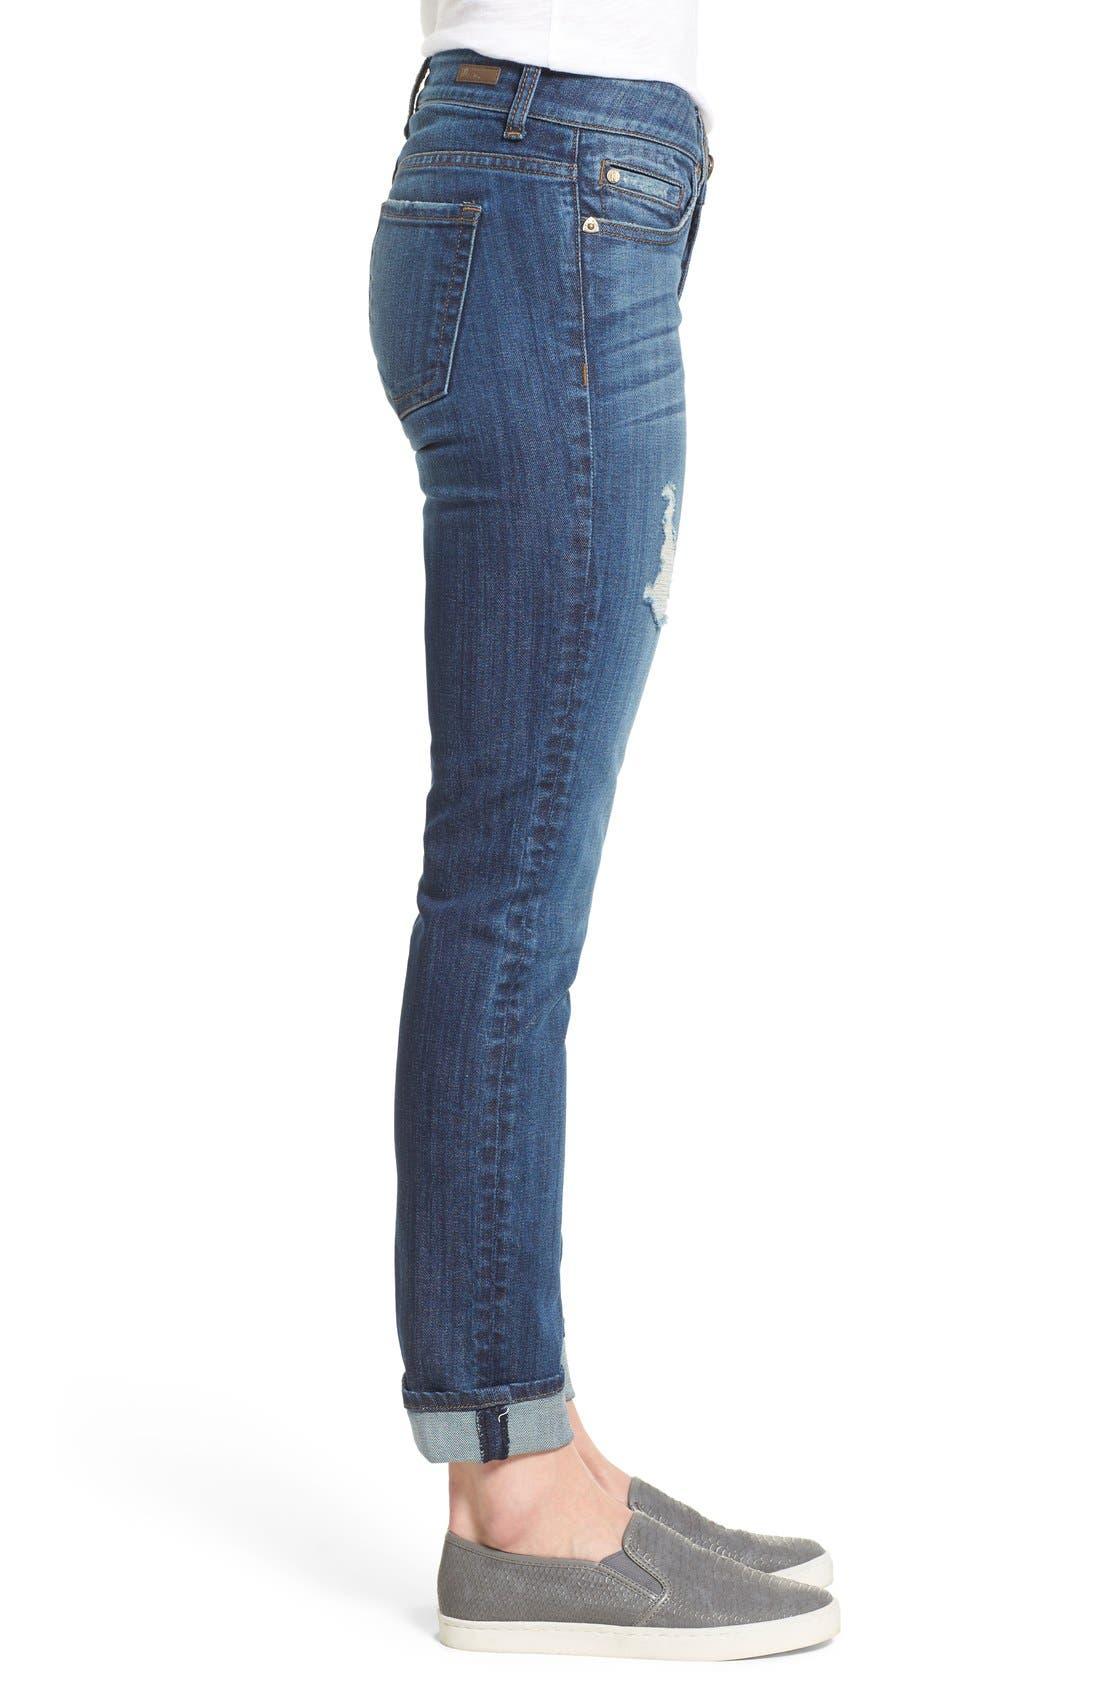 Alternate Image 3  - KUT from the Kloth 'Catherine' Distressed Stretch Boyfriend Jeans (Yearn) (Regular & Petite)